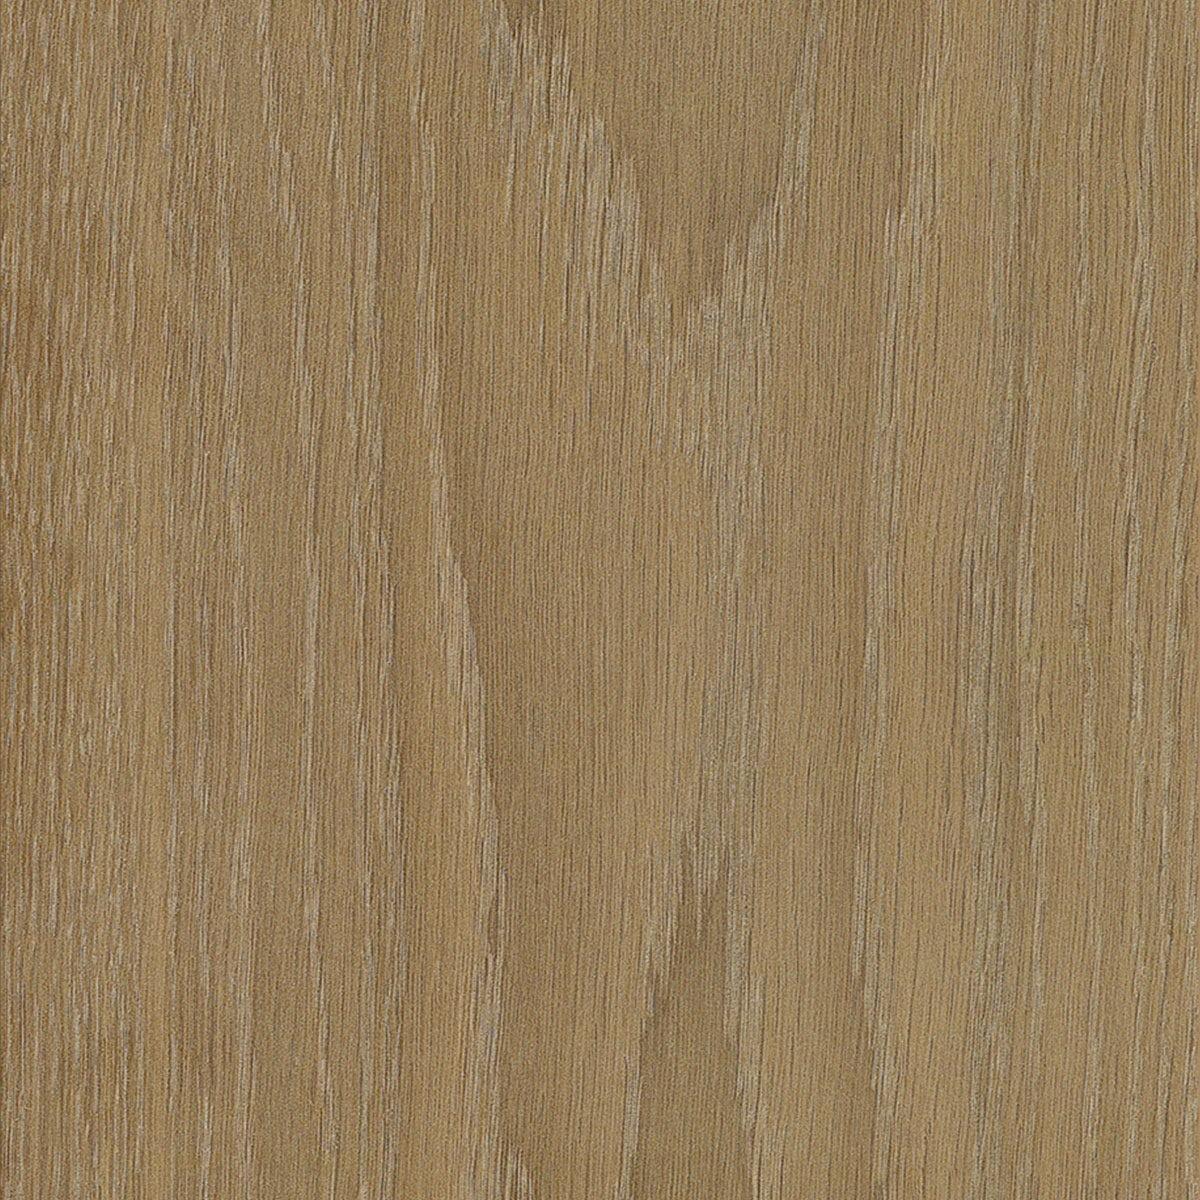 Krono Xonic goldrush waterproof vinyl flooring sample